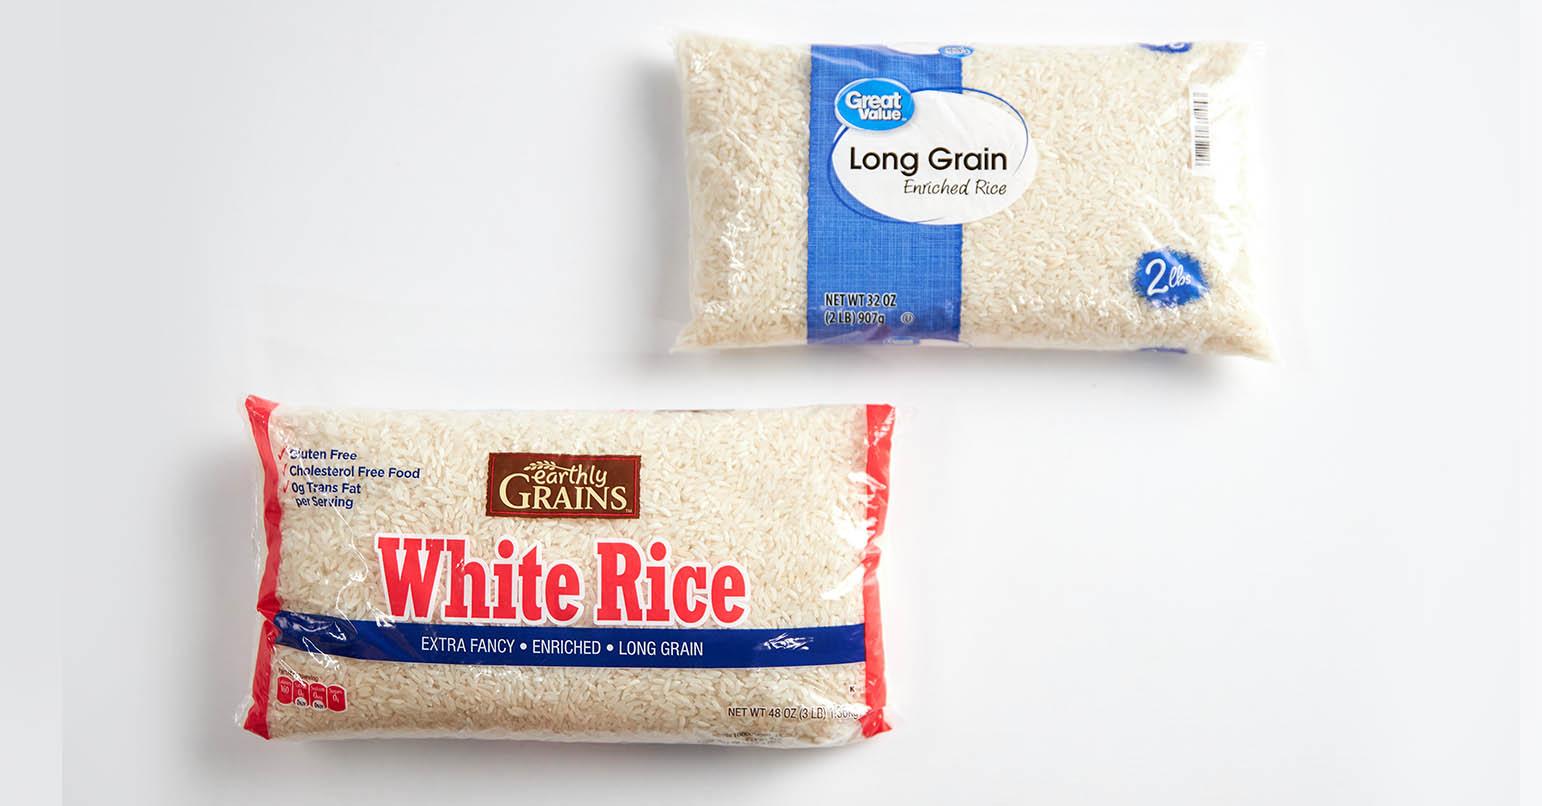 Aldi vs Walmart Rice